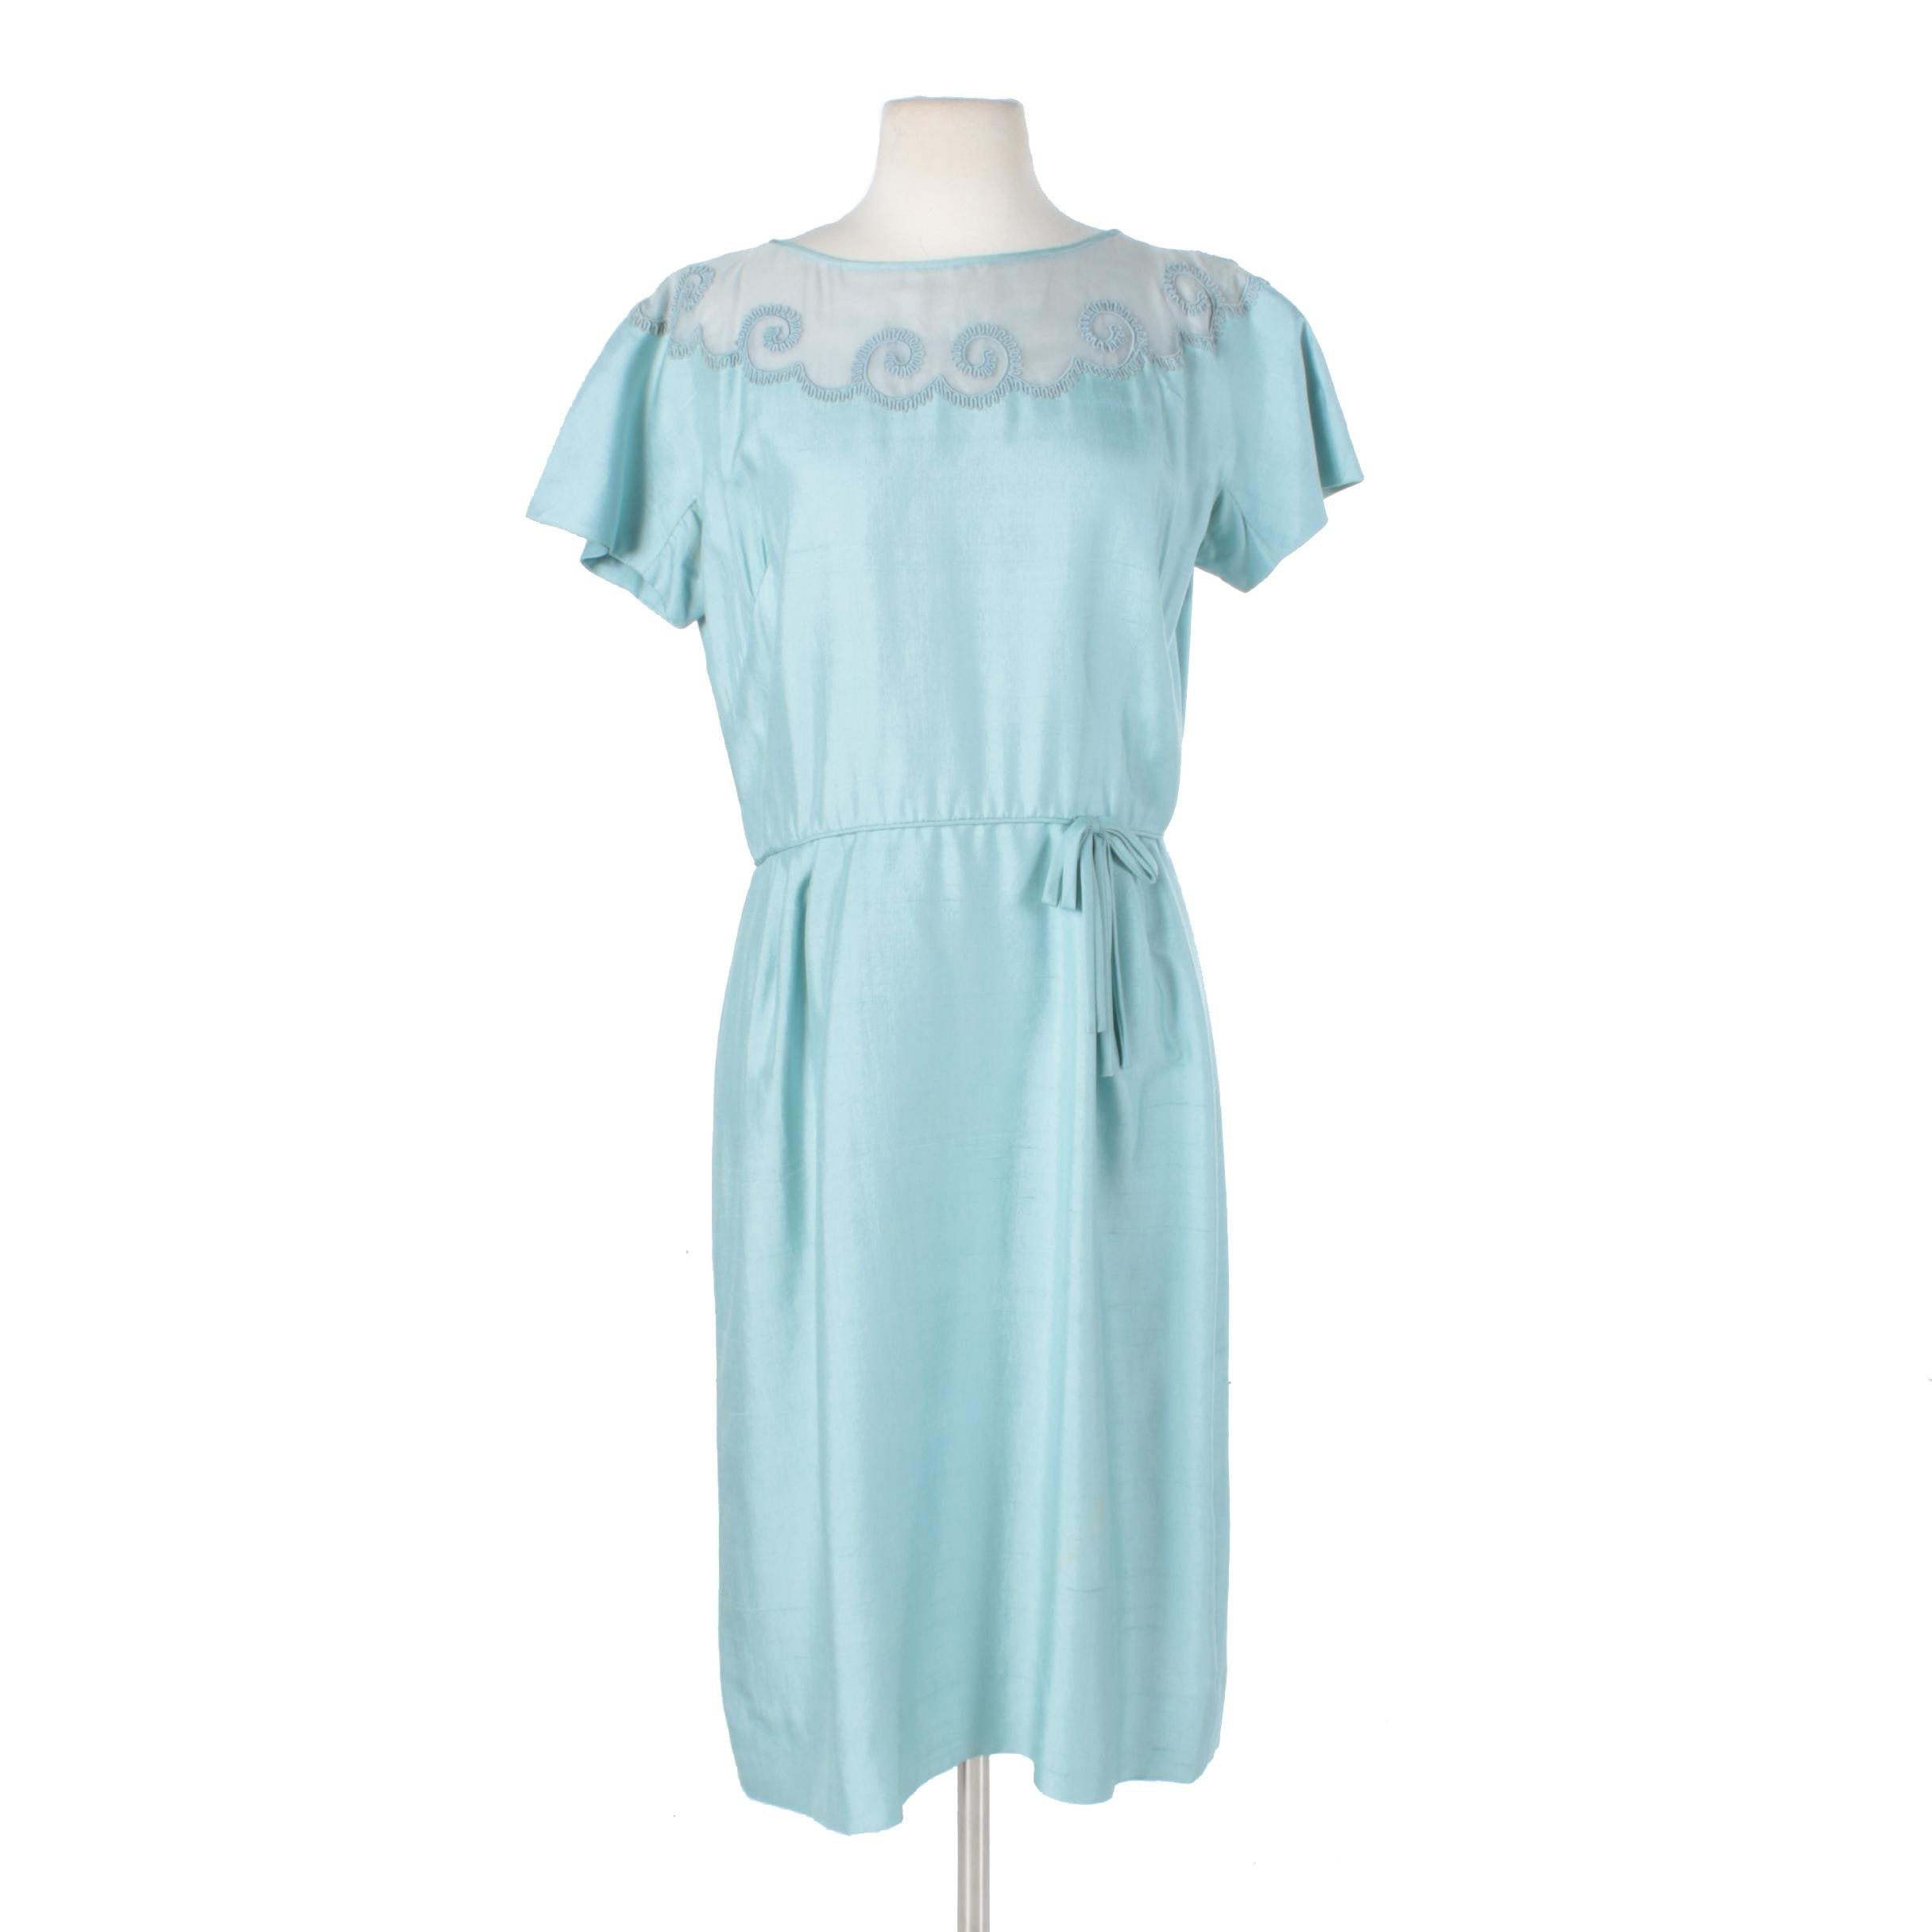 1950s Aquamarine Dupioni Silk and Lace Cocktail Dress